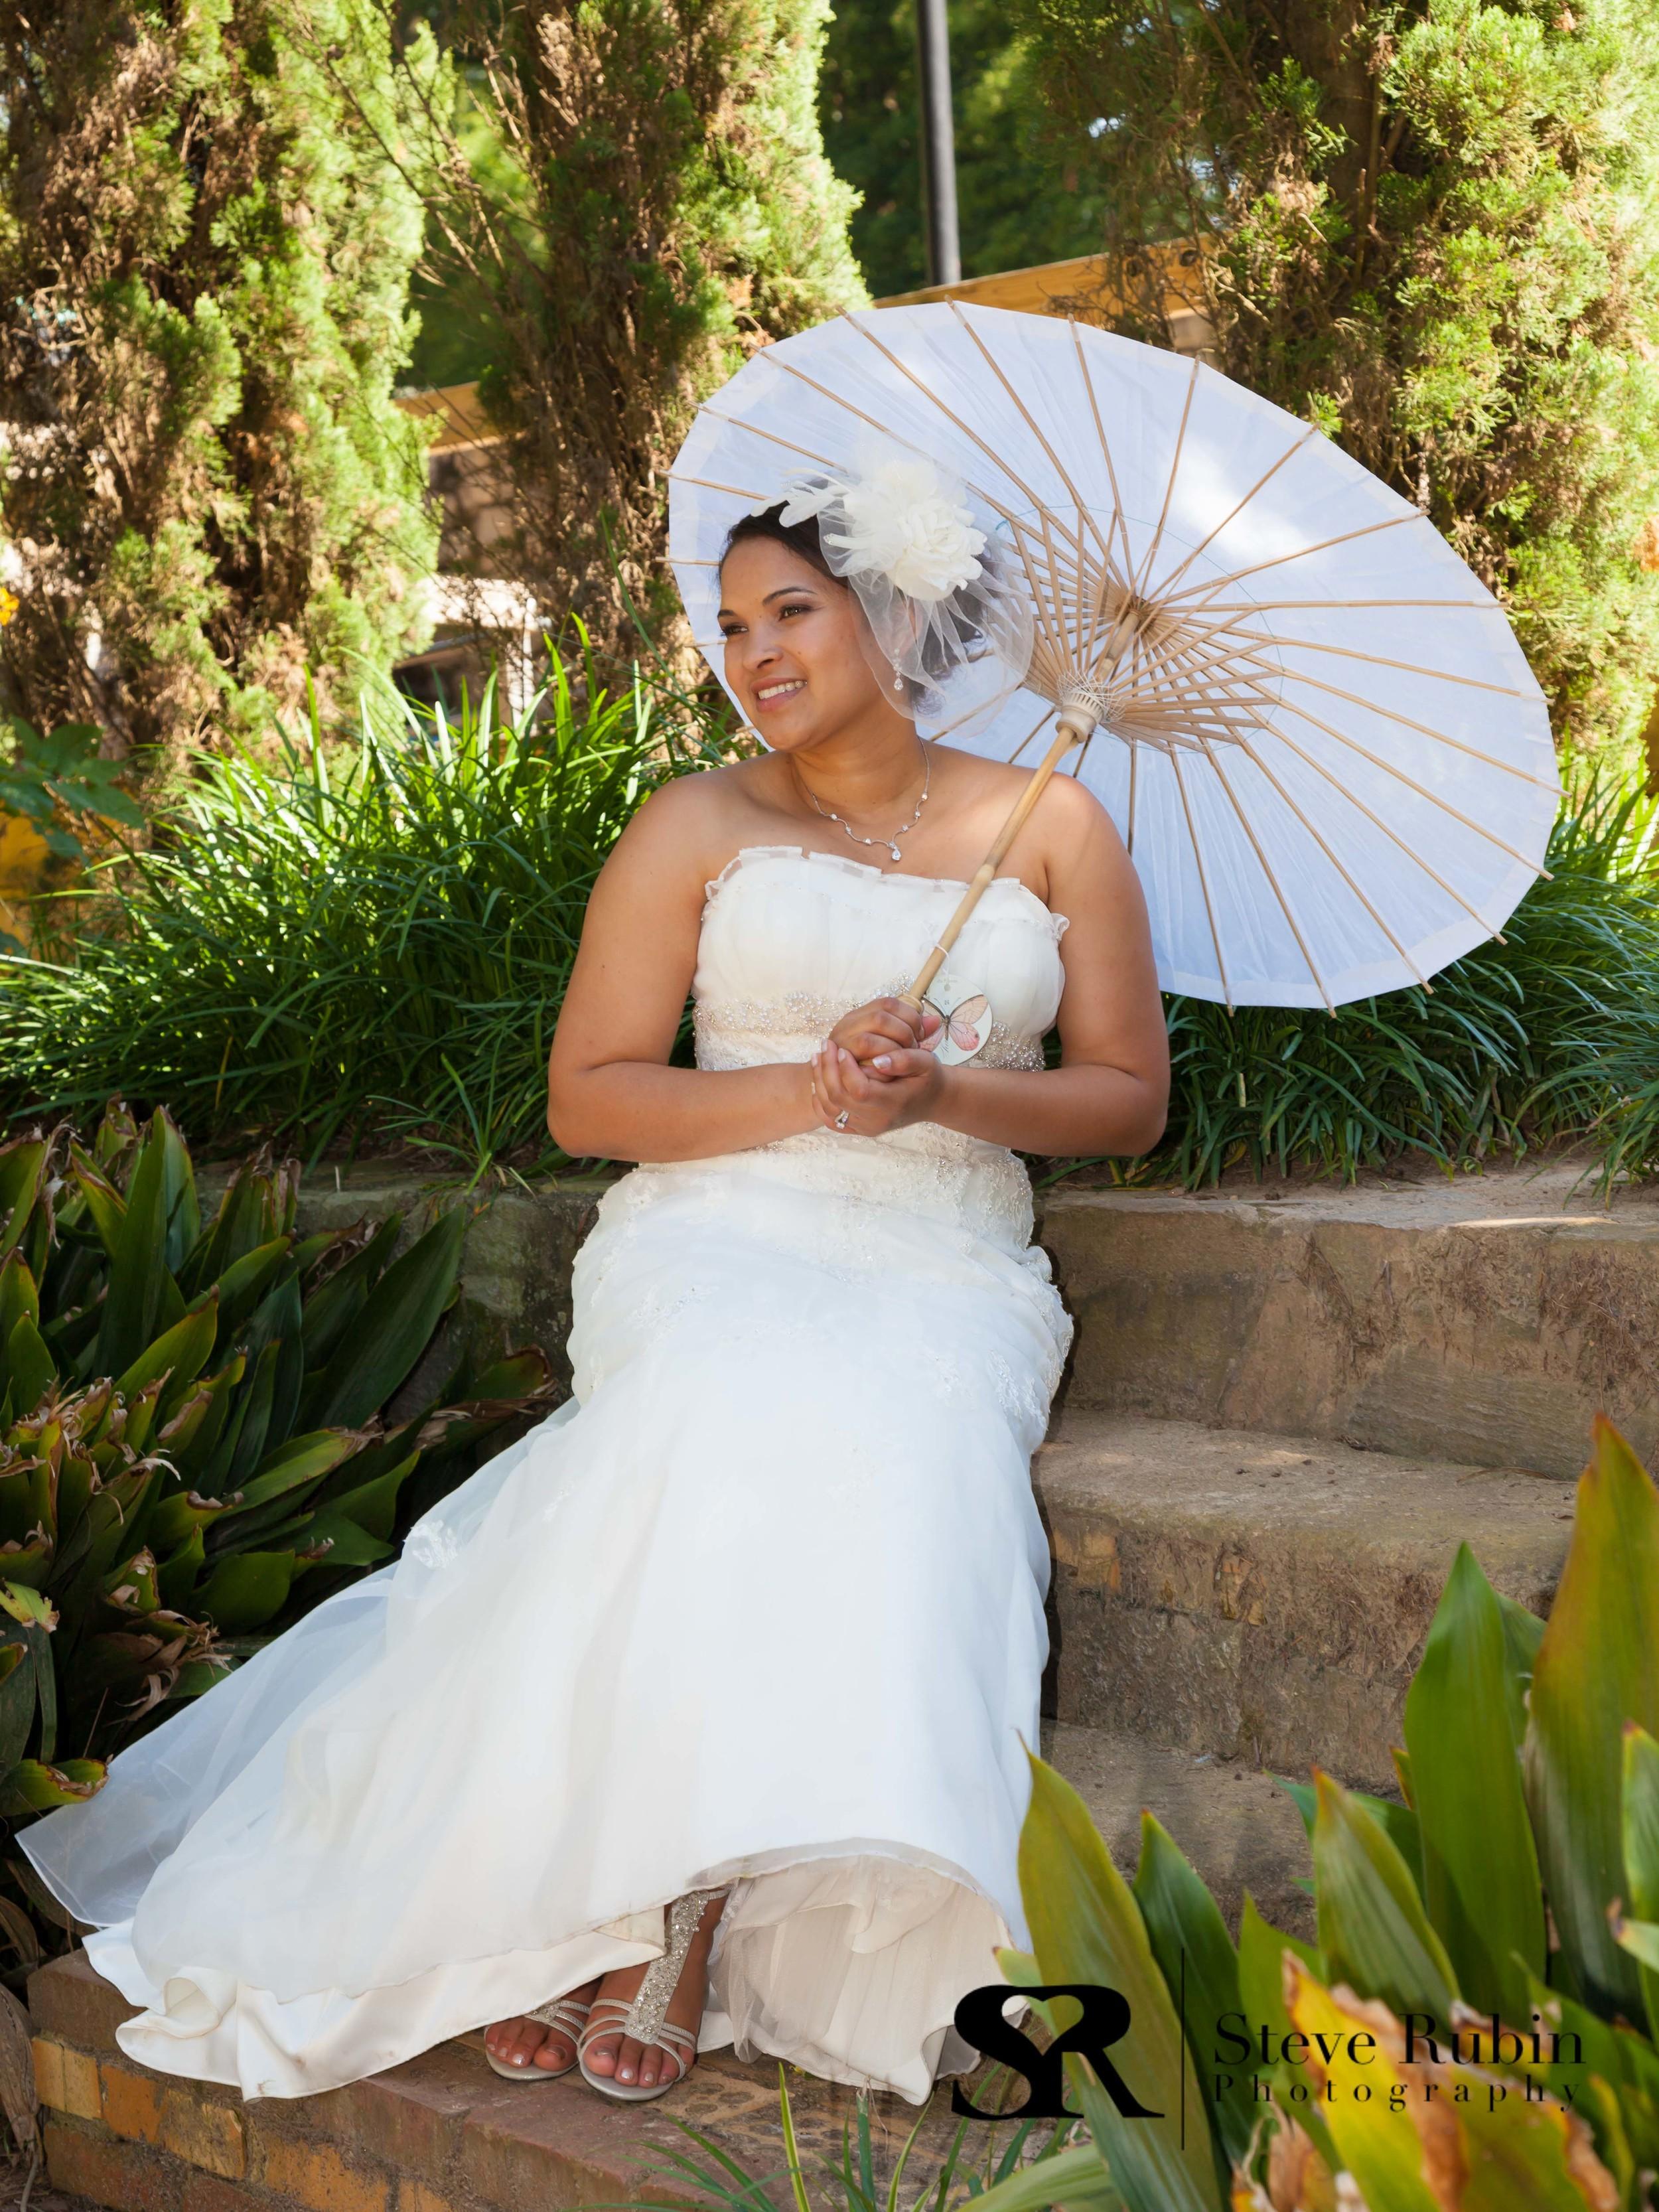 Bride with Parasol at Raleigh Rose Garden